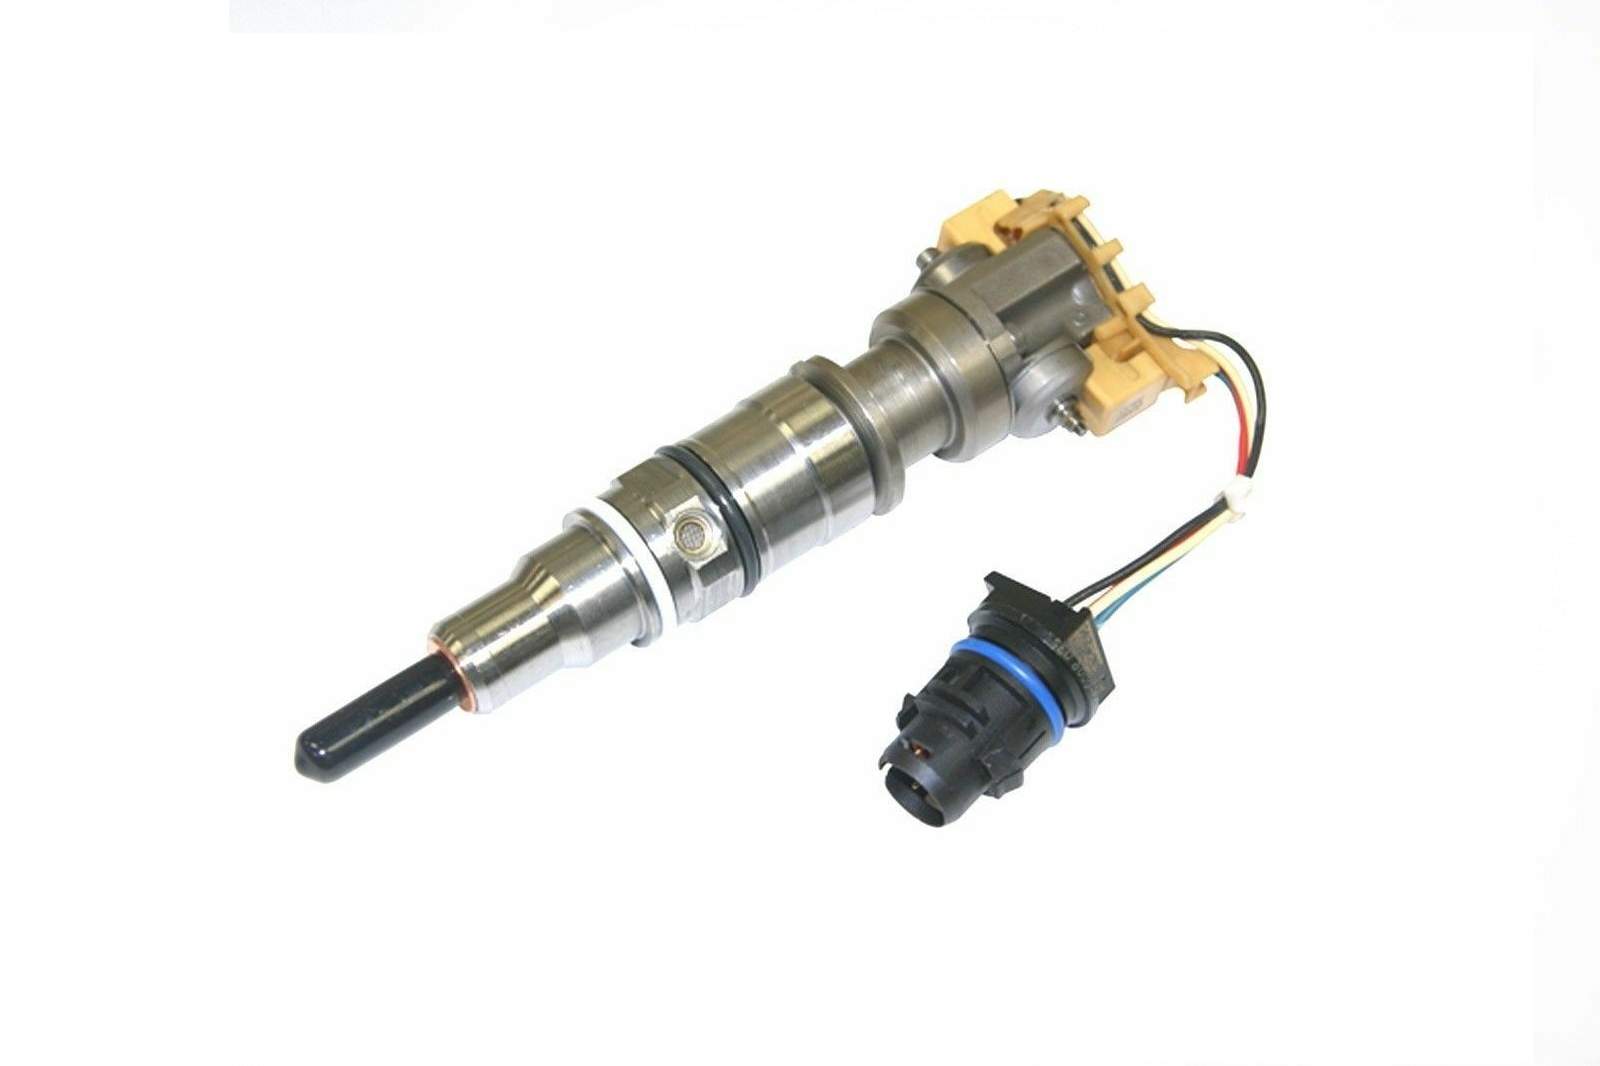 Damaged Electrical plug 2003-2007 Ford PowerStroke 6.0 Diesel Fuel Injectors